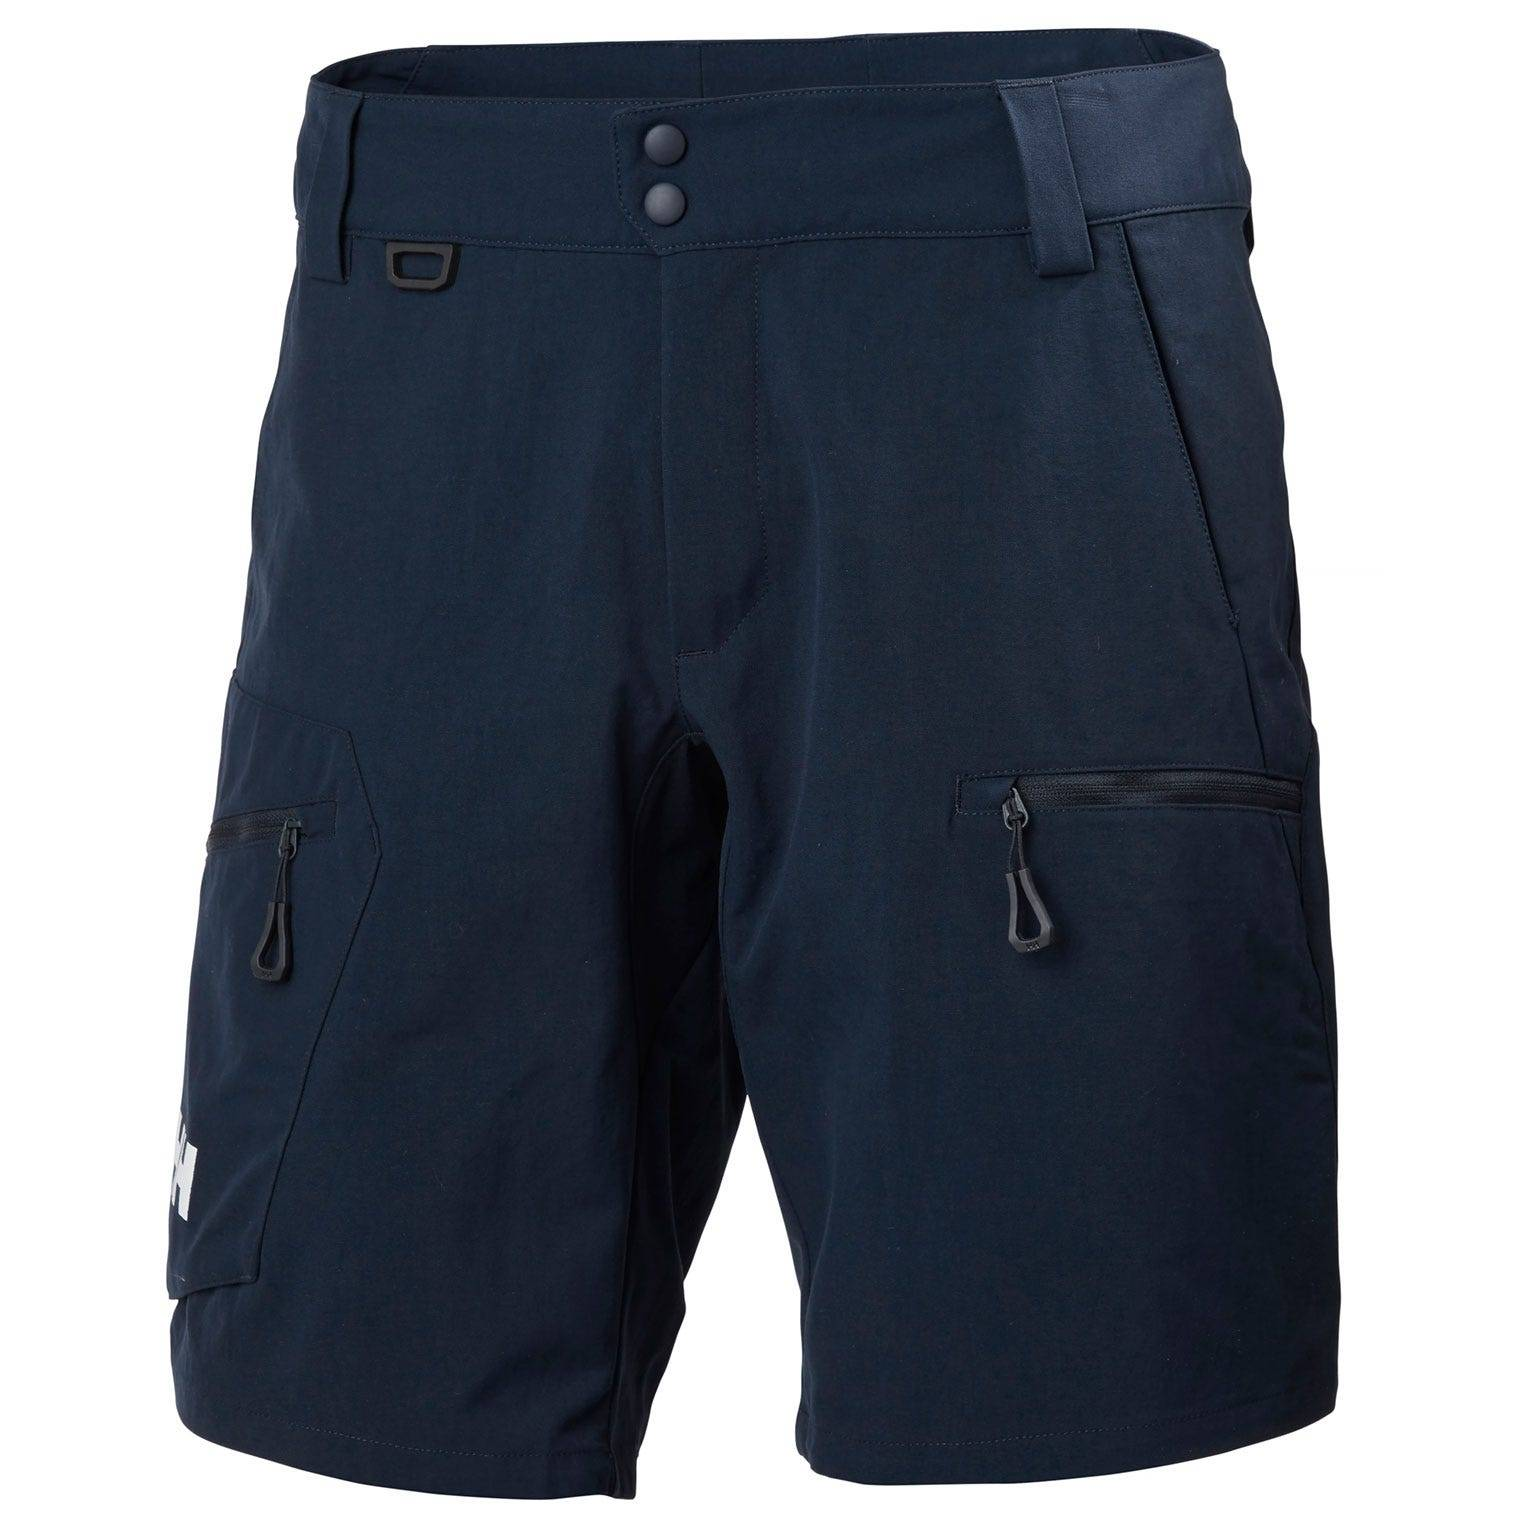 Helly Hansen Crewline Cargo Shorts Mens Sailing Pant Navy 36